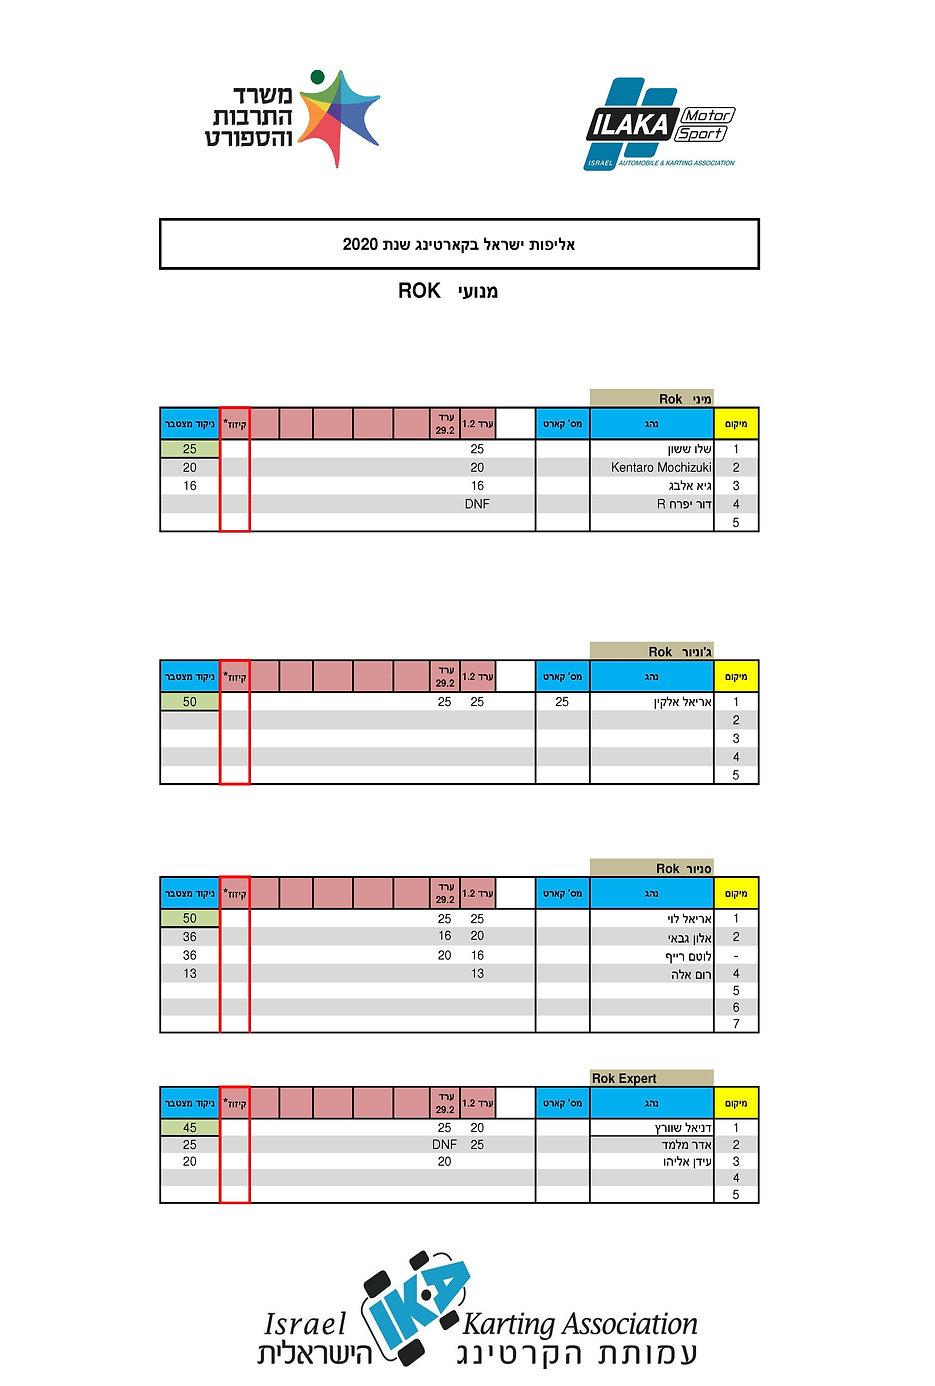 Rok 2020 אליפות ישראל בקארטינג